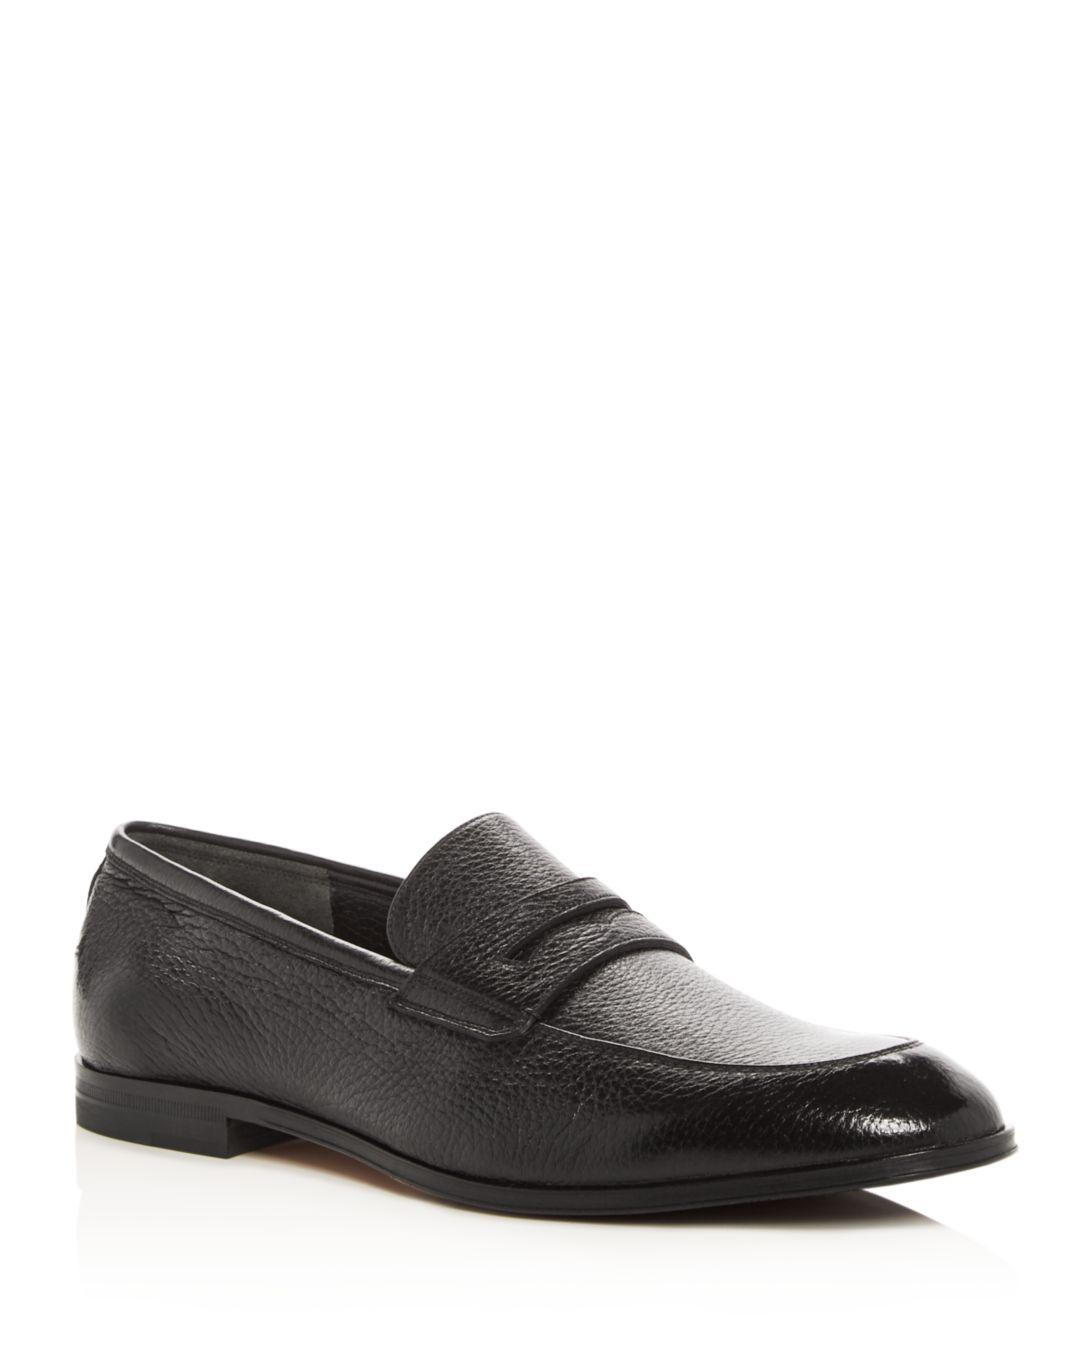 55de8338760 Bally - Black Men s Webb Leather Penny Loafers for Men - Lyst. View  fullscreen